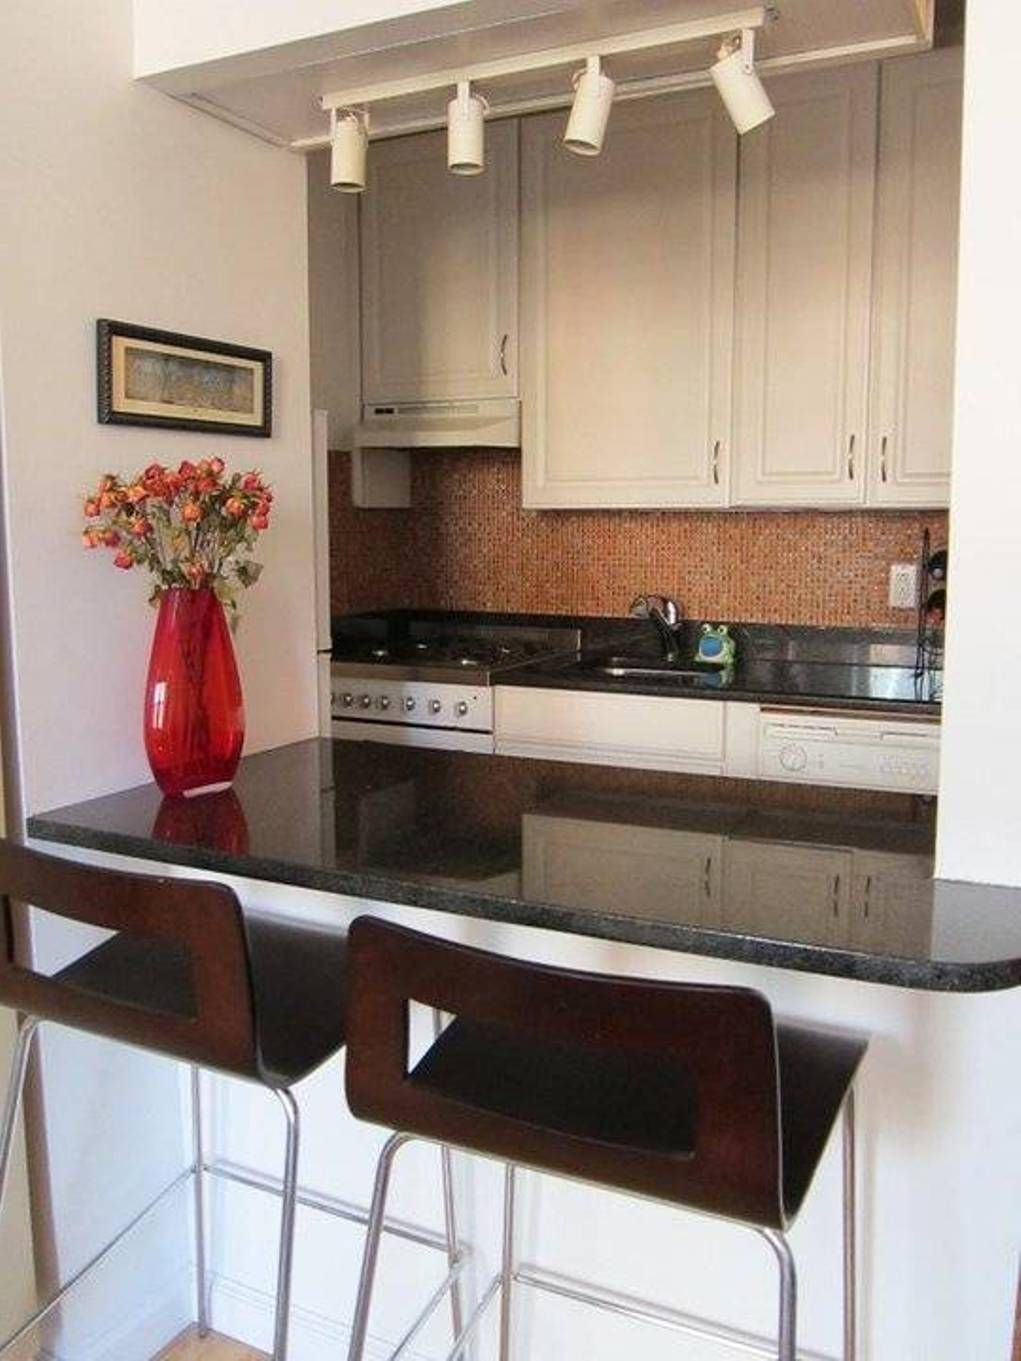 Licious Small Kitchen Granite Countertops  Granite Countertops Prepossessing Kitchen Design For Small Houses Inspiration Design